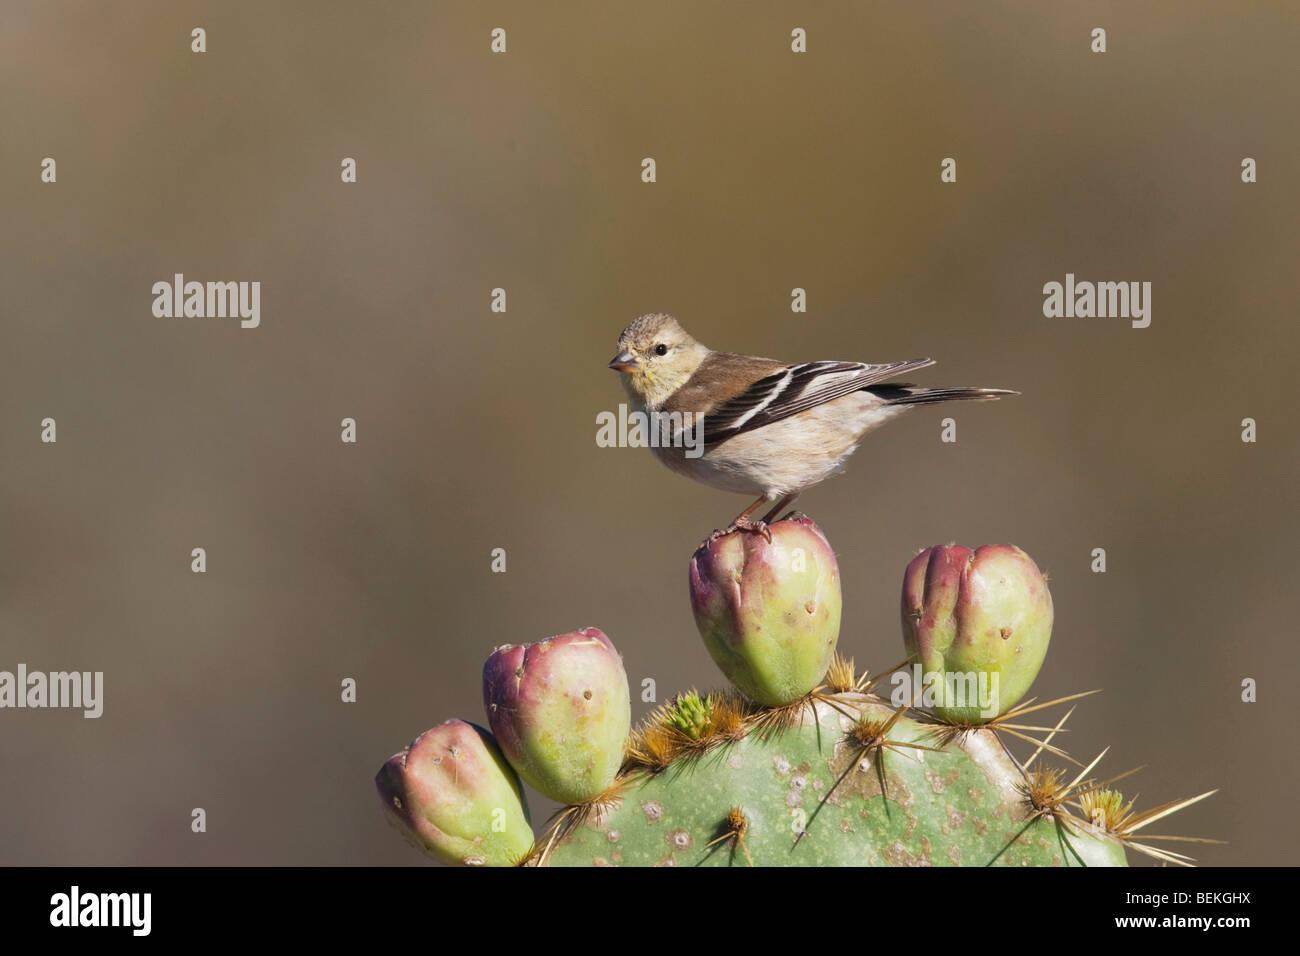 American Goldfinch (Carduelis tristis), adult on cactus in winter plumage, Welder Wildlife Refuge, Sinton, Texas, - Stock Image